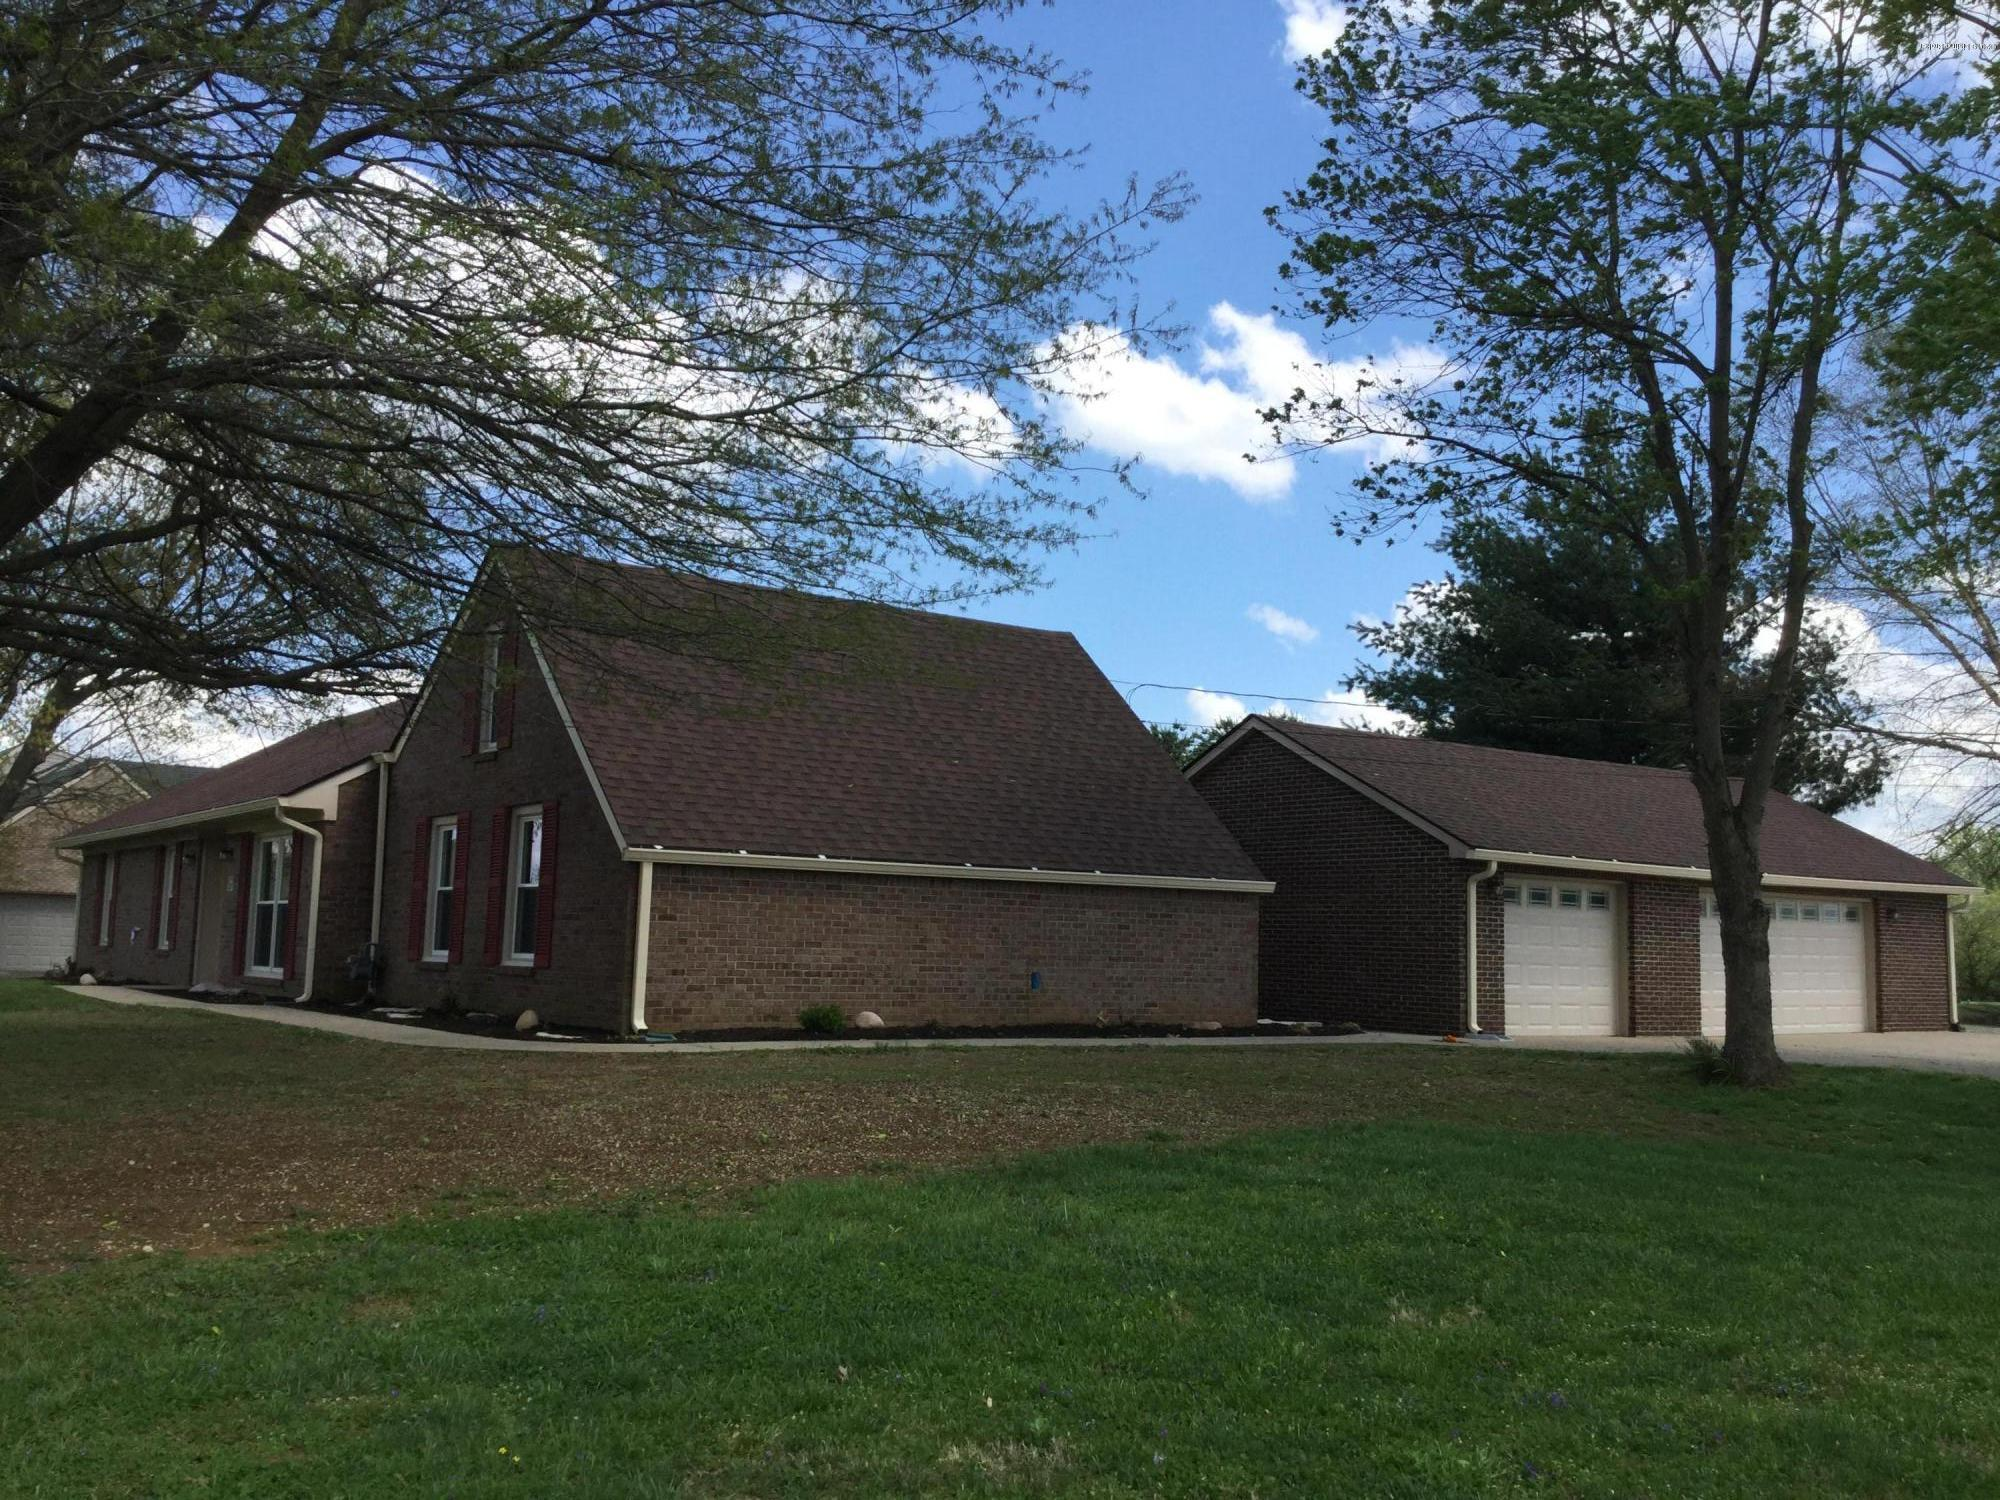 434 Cliffside Dr, Shepherdsville, Kentucky 40165, 4 Bedrooms Bedrooms, 10 Rooms Rooms,2 BathroomsBathrooms,Residential,For Sale,Cliffside,1534482